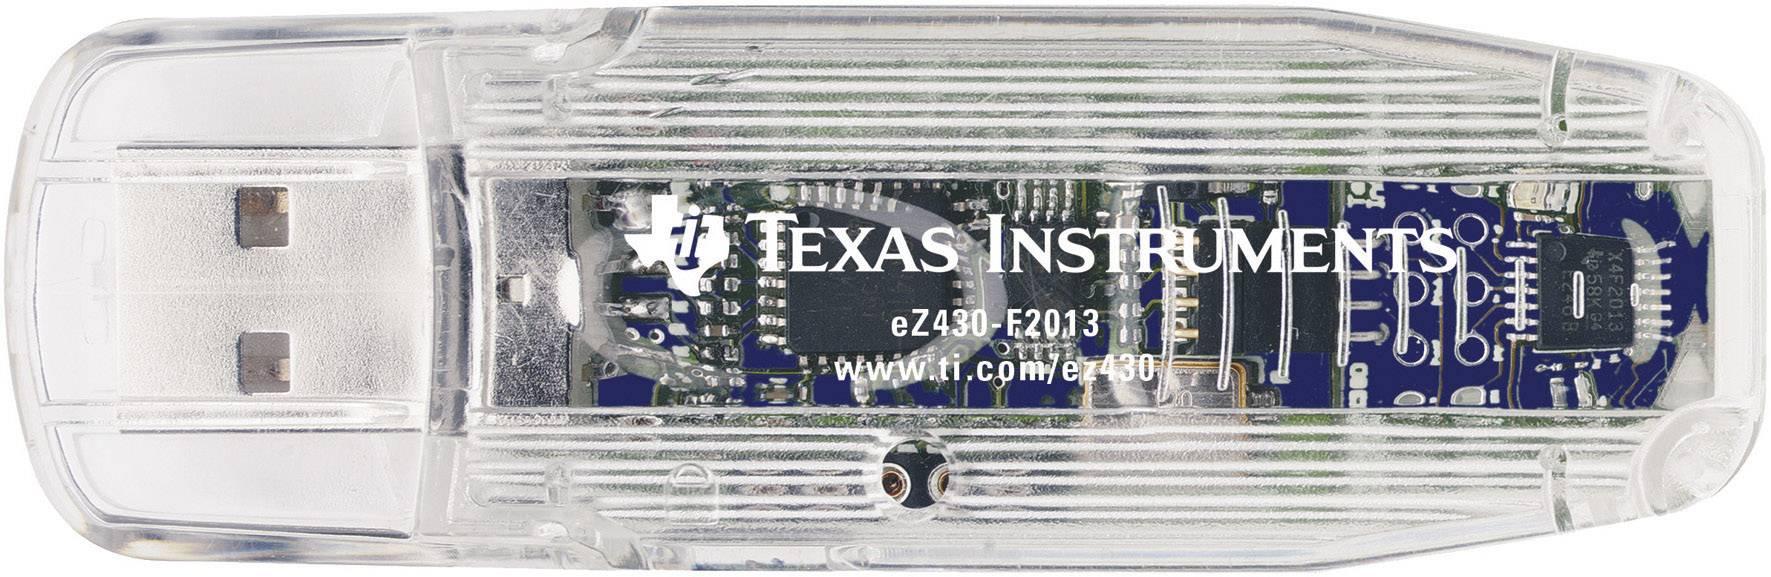 Vývojový USB stick MSP 430 Texas Instruments eZ430-F2013